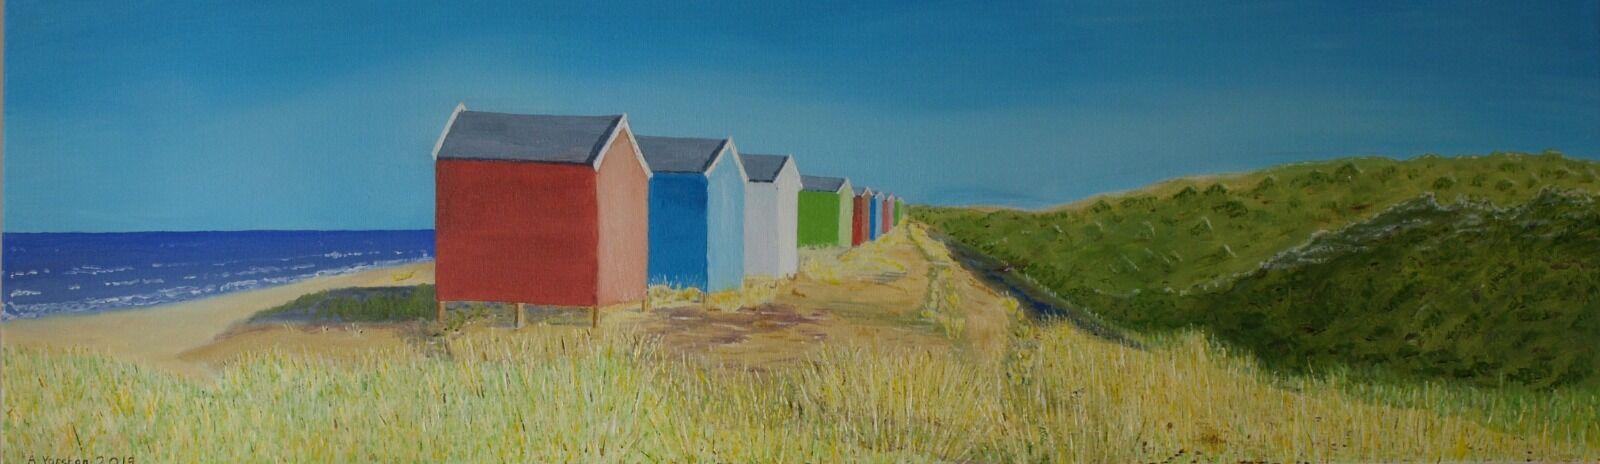 Findhorn Beach Huts. 99.9cm x 29.7cm. Oil